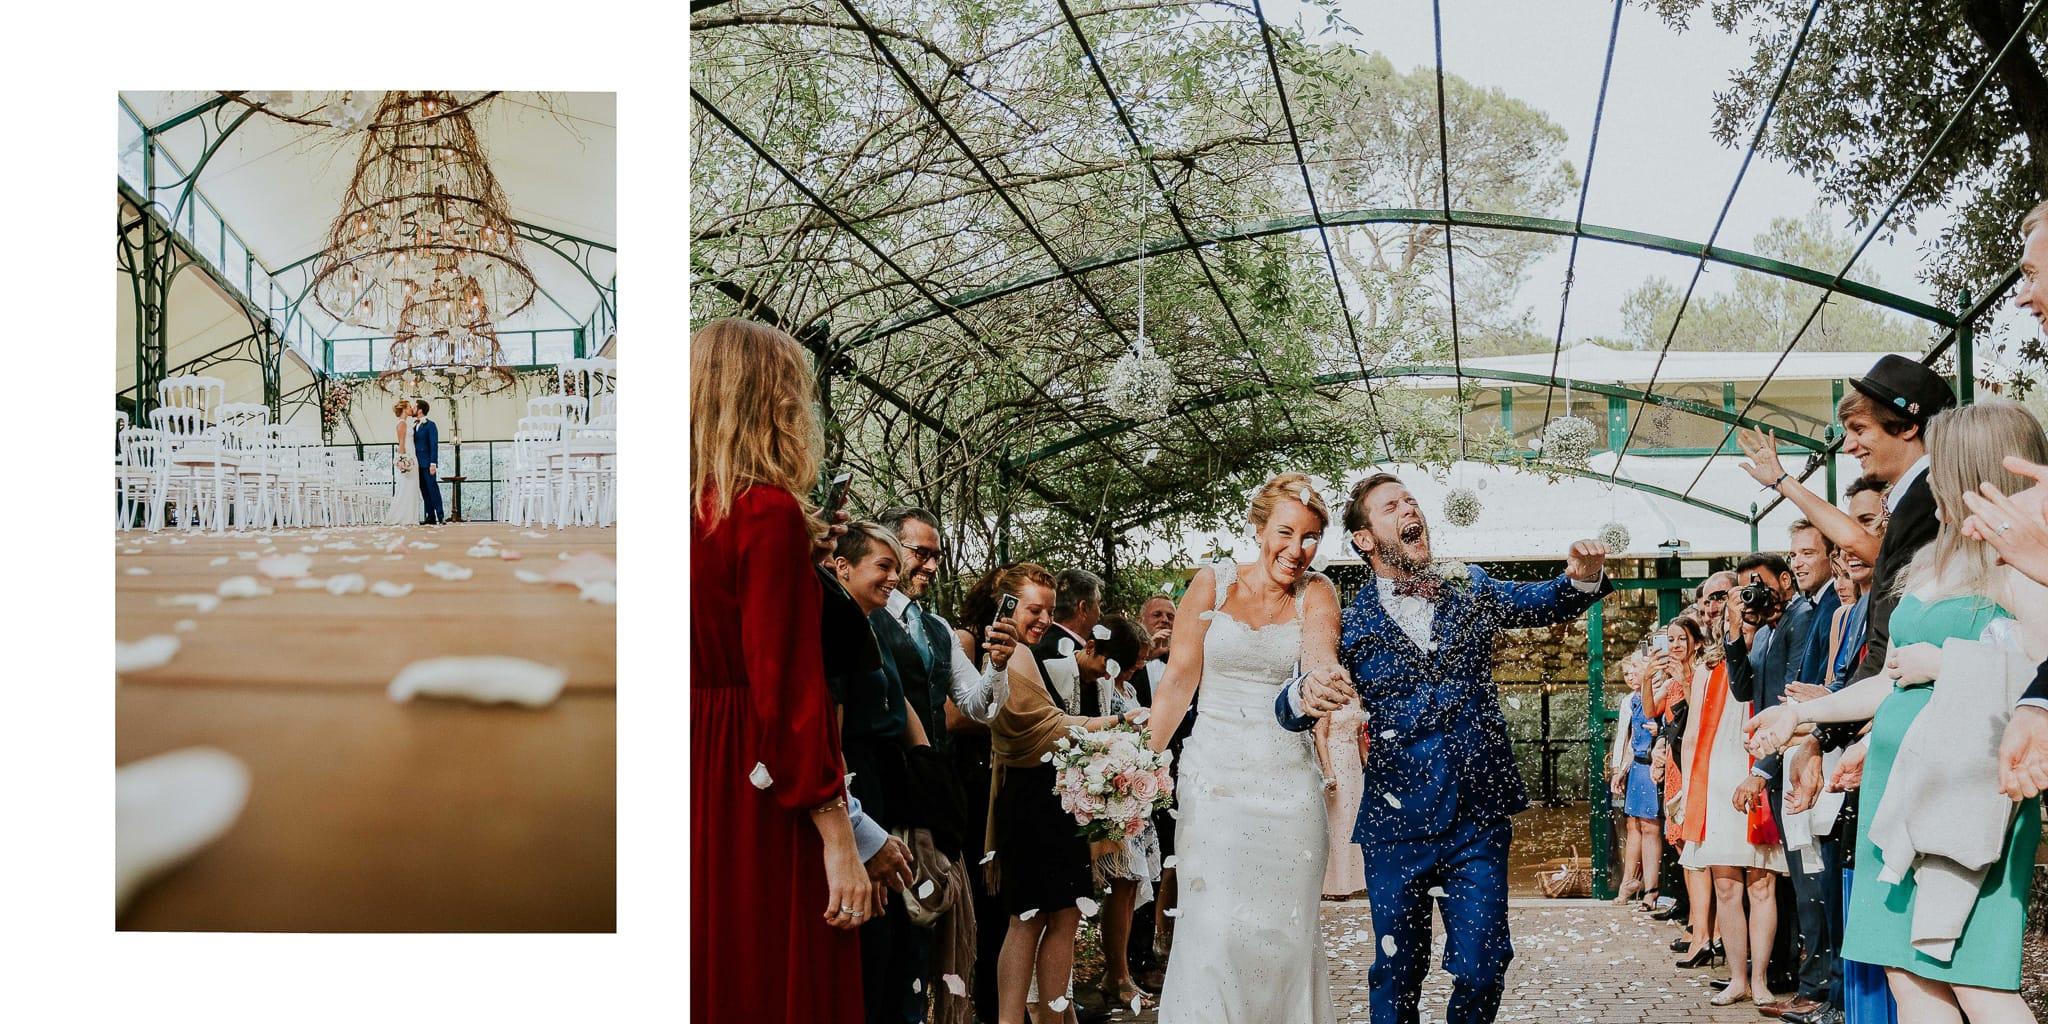 Costi-Moiceanu-Photographer-CM-Photography-Wedding-Mariage-French-Riviera-Cote-D-Azur-Alpes-Maritimes-Weding-Album-Design-11